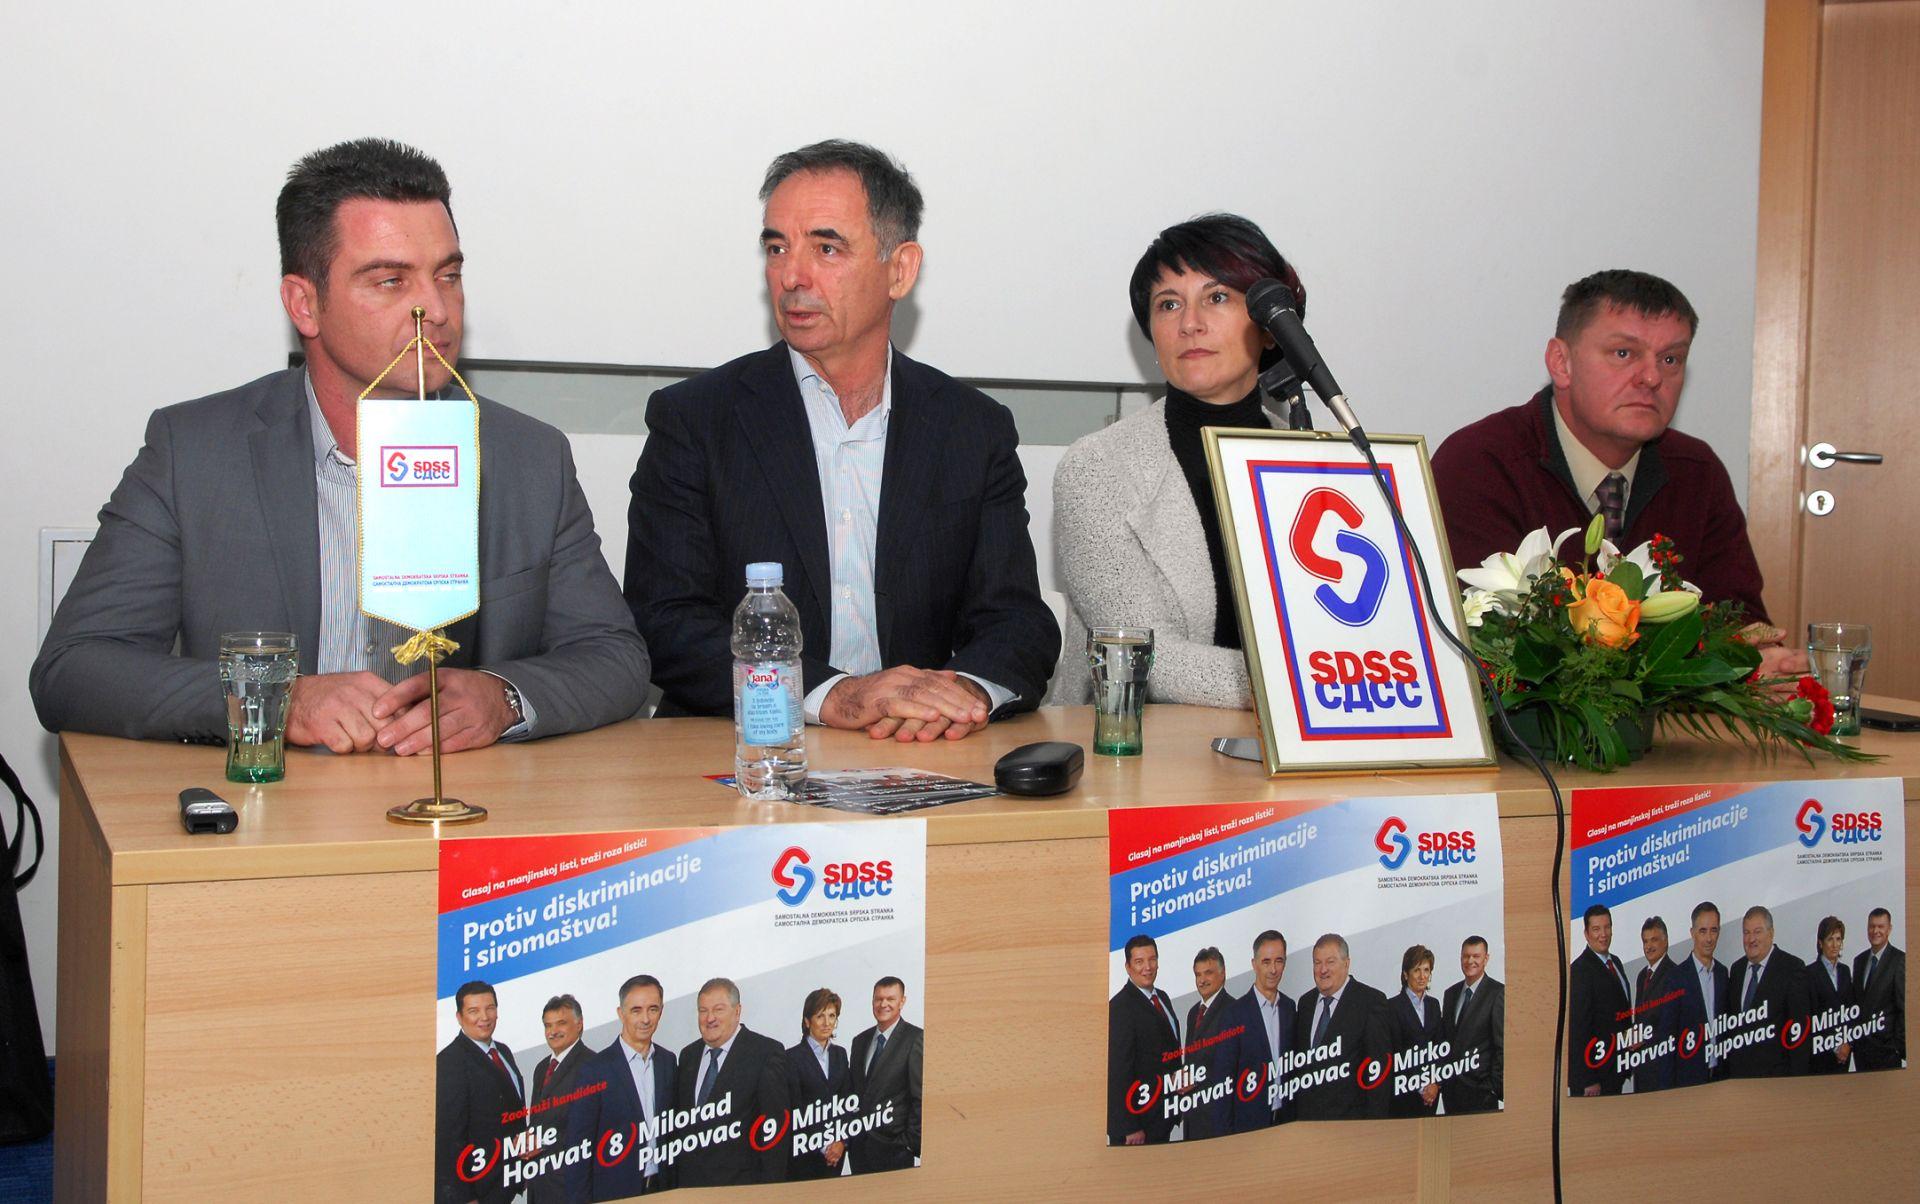 SDSS Najoštrija osuda nasilja nad demokracijom gospodina Željka Solde (HSP)